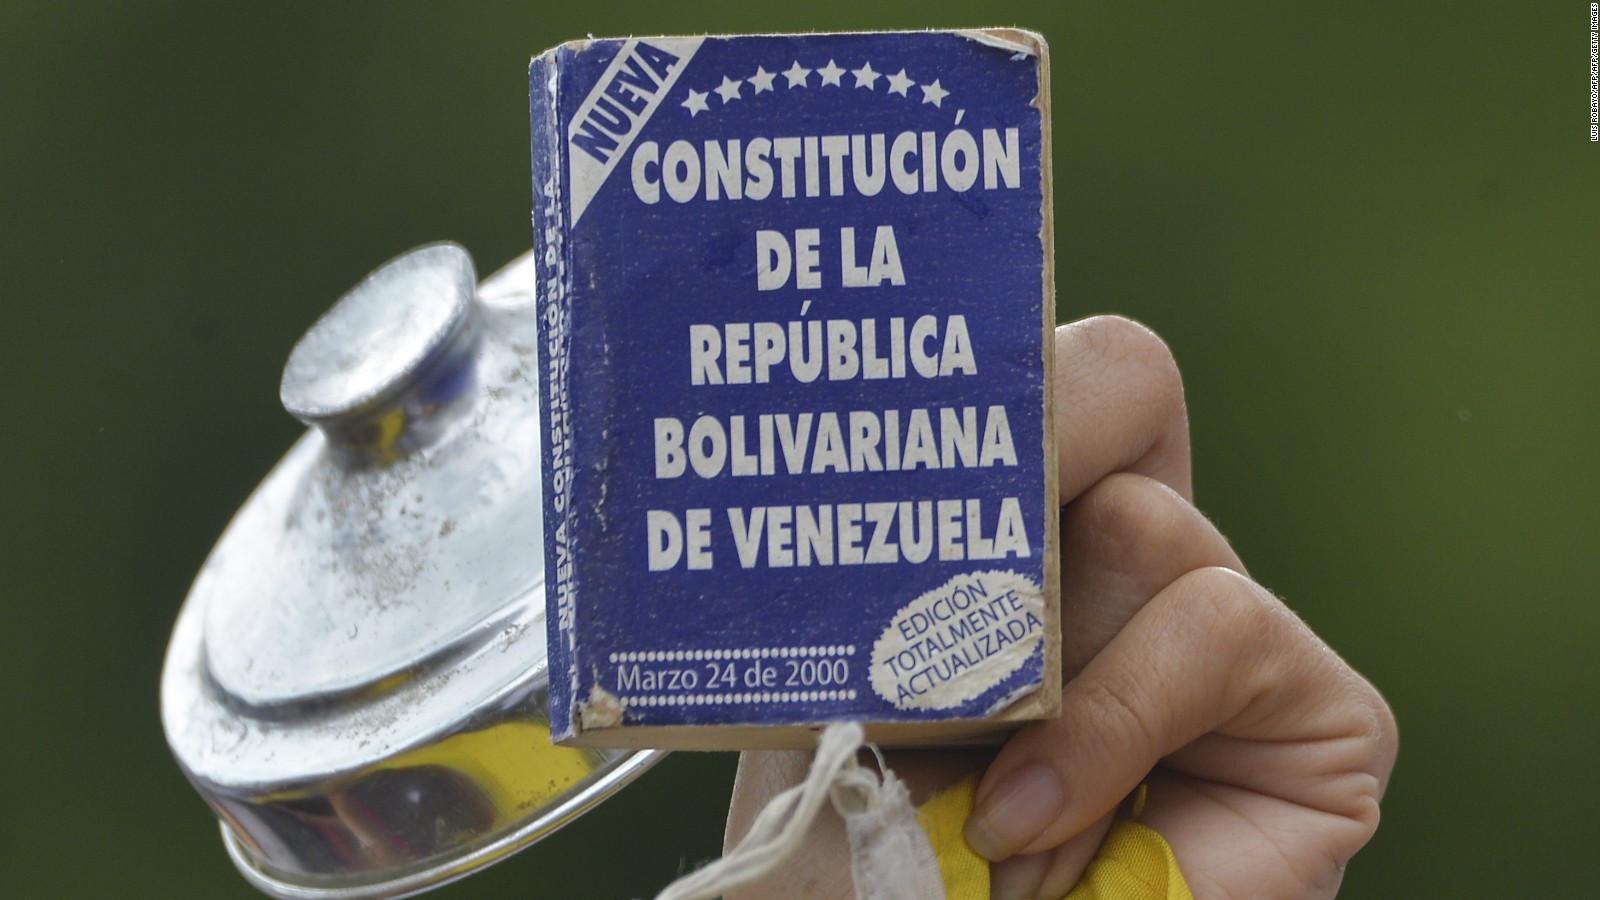 dia-del-poder-popular-constituyente